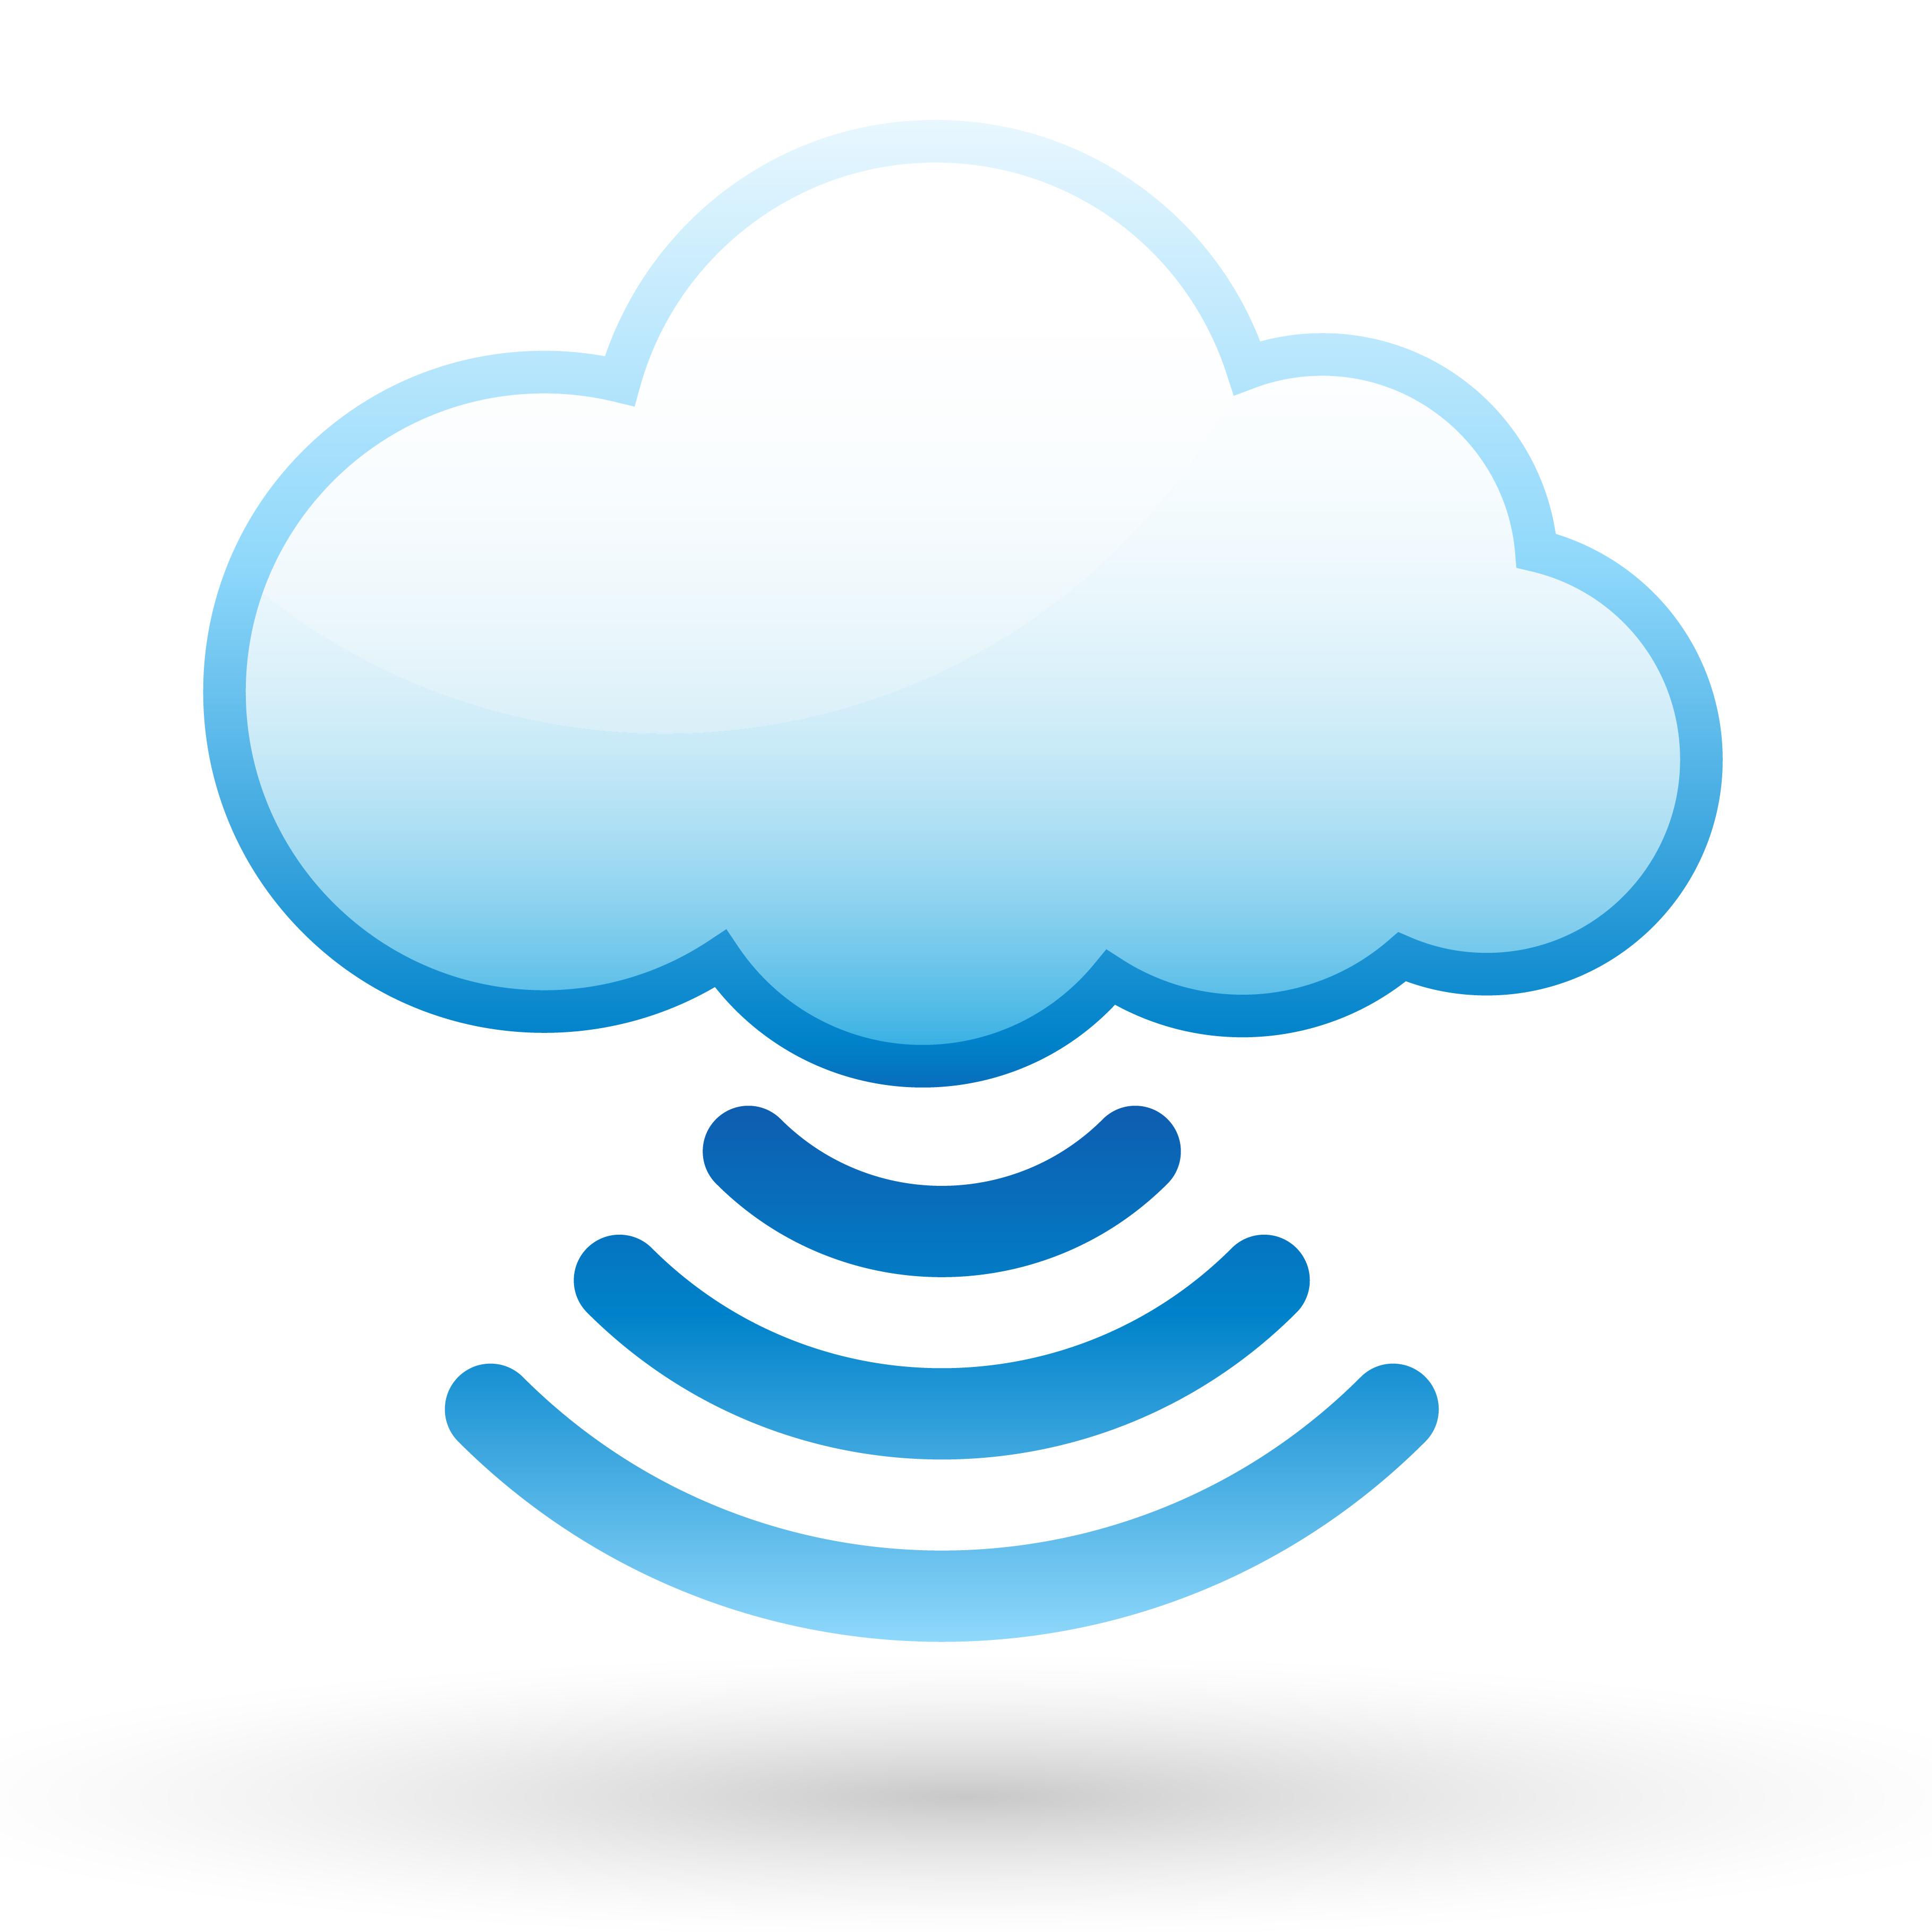 Free server cliparts download. Clipart cloud computer